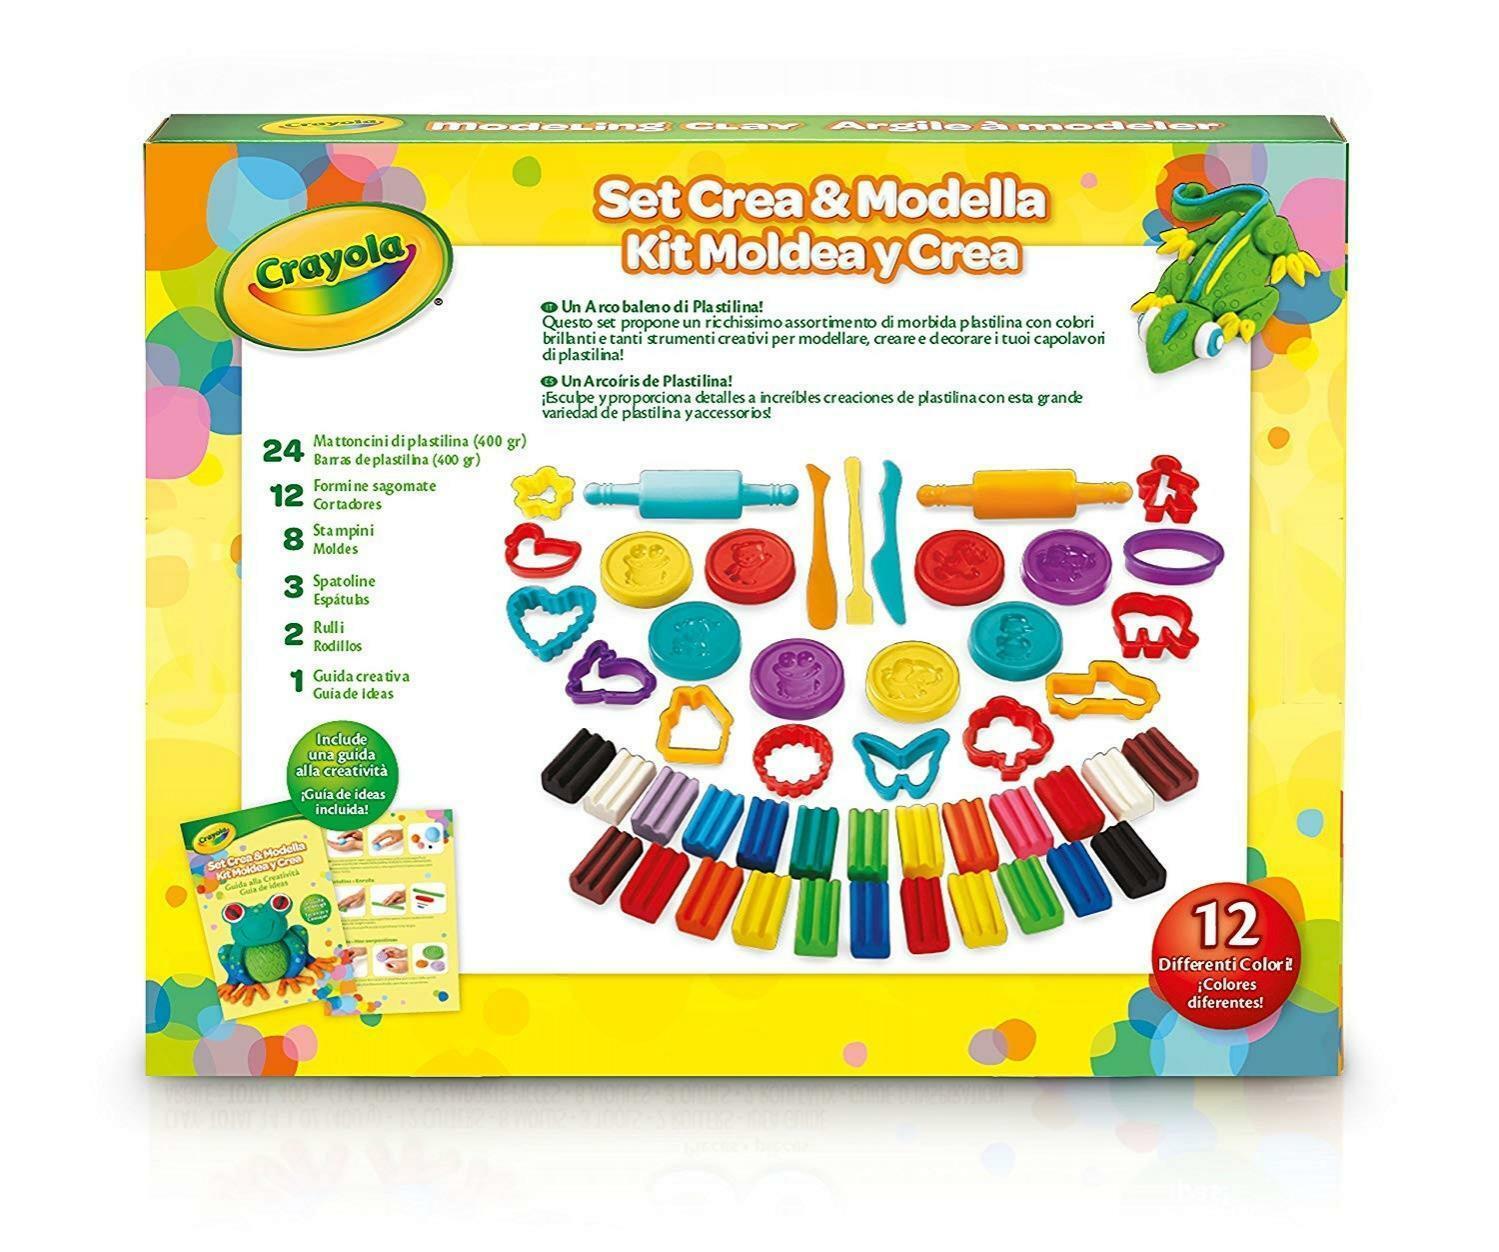 crayola set crea e modella plastilina